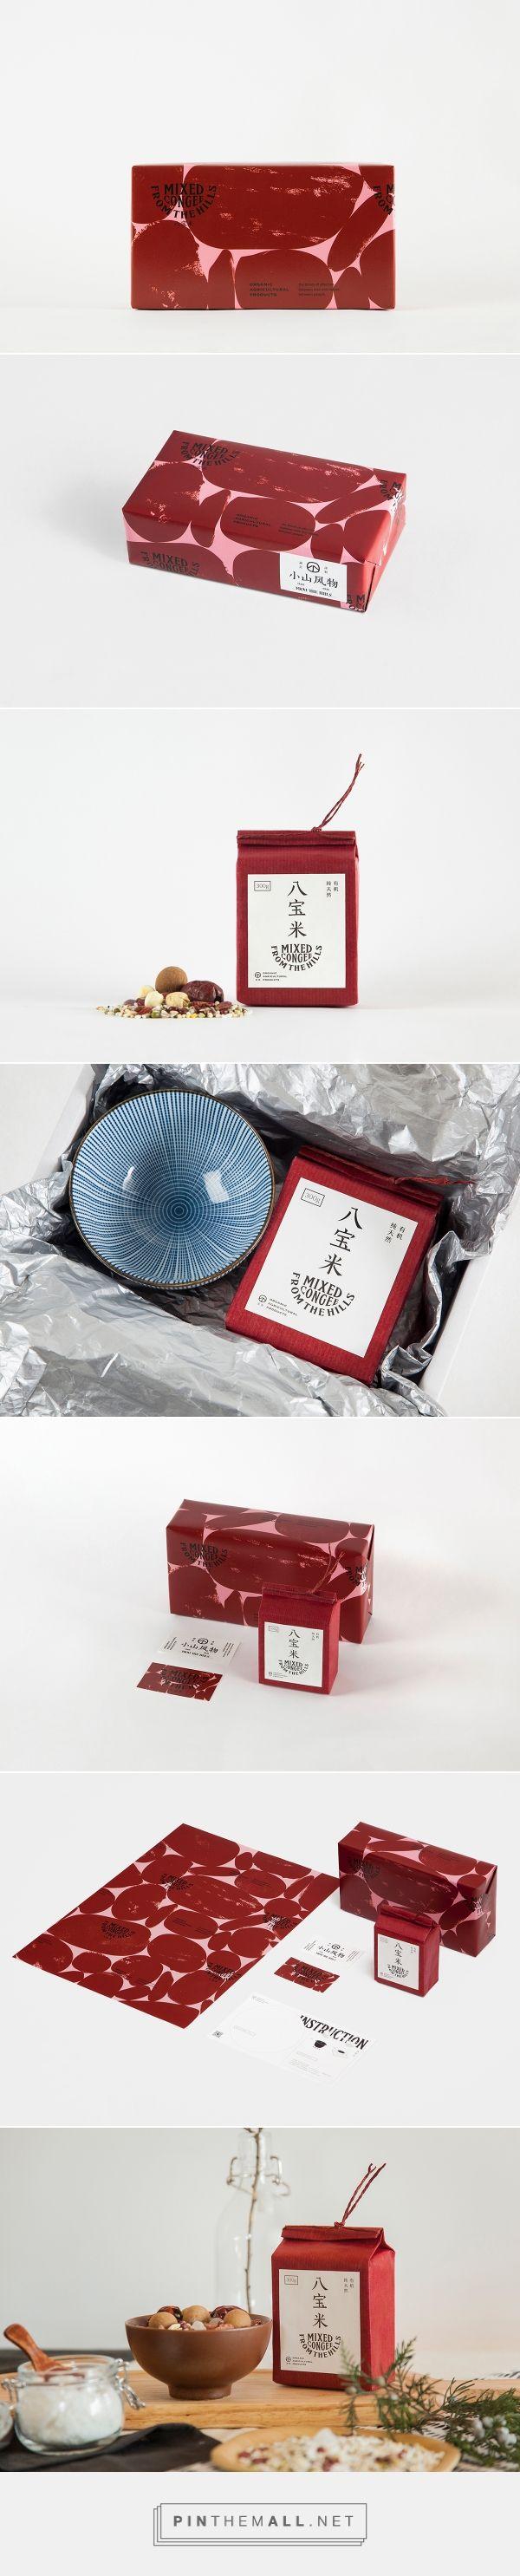 小山风物 八宝米礼盒 on Behance - created via https://pinthemall.net